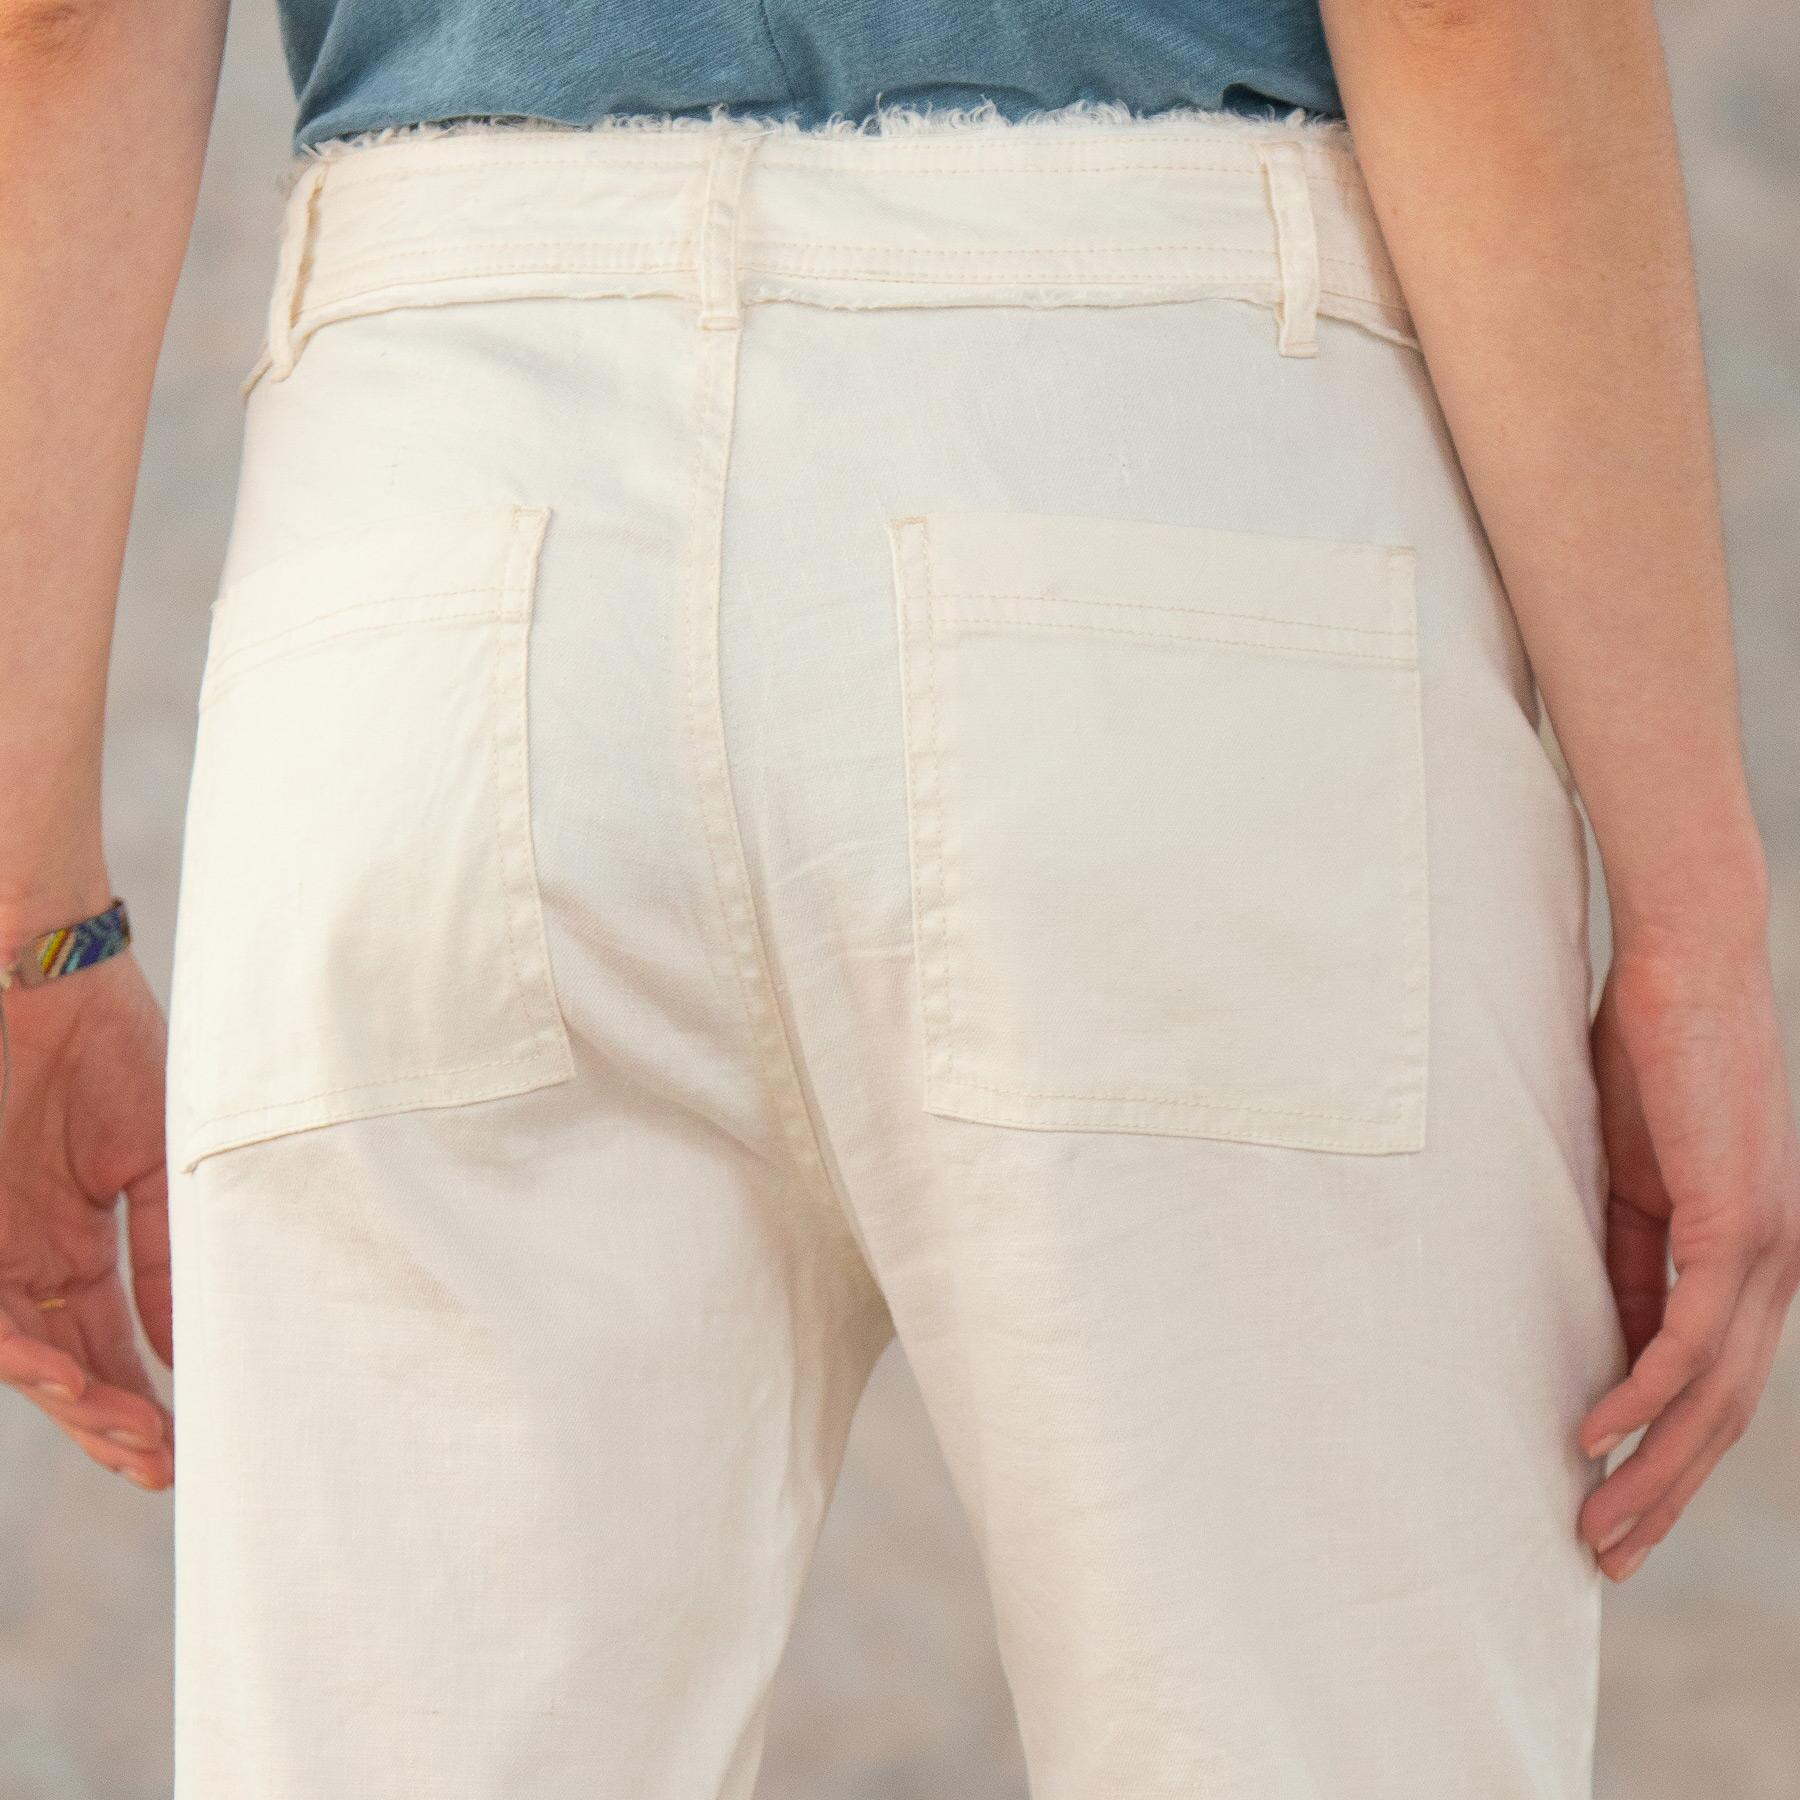 DORSEY PANTS - PETITES: View 6